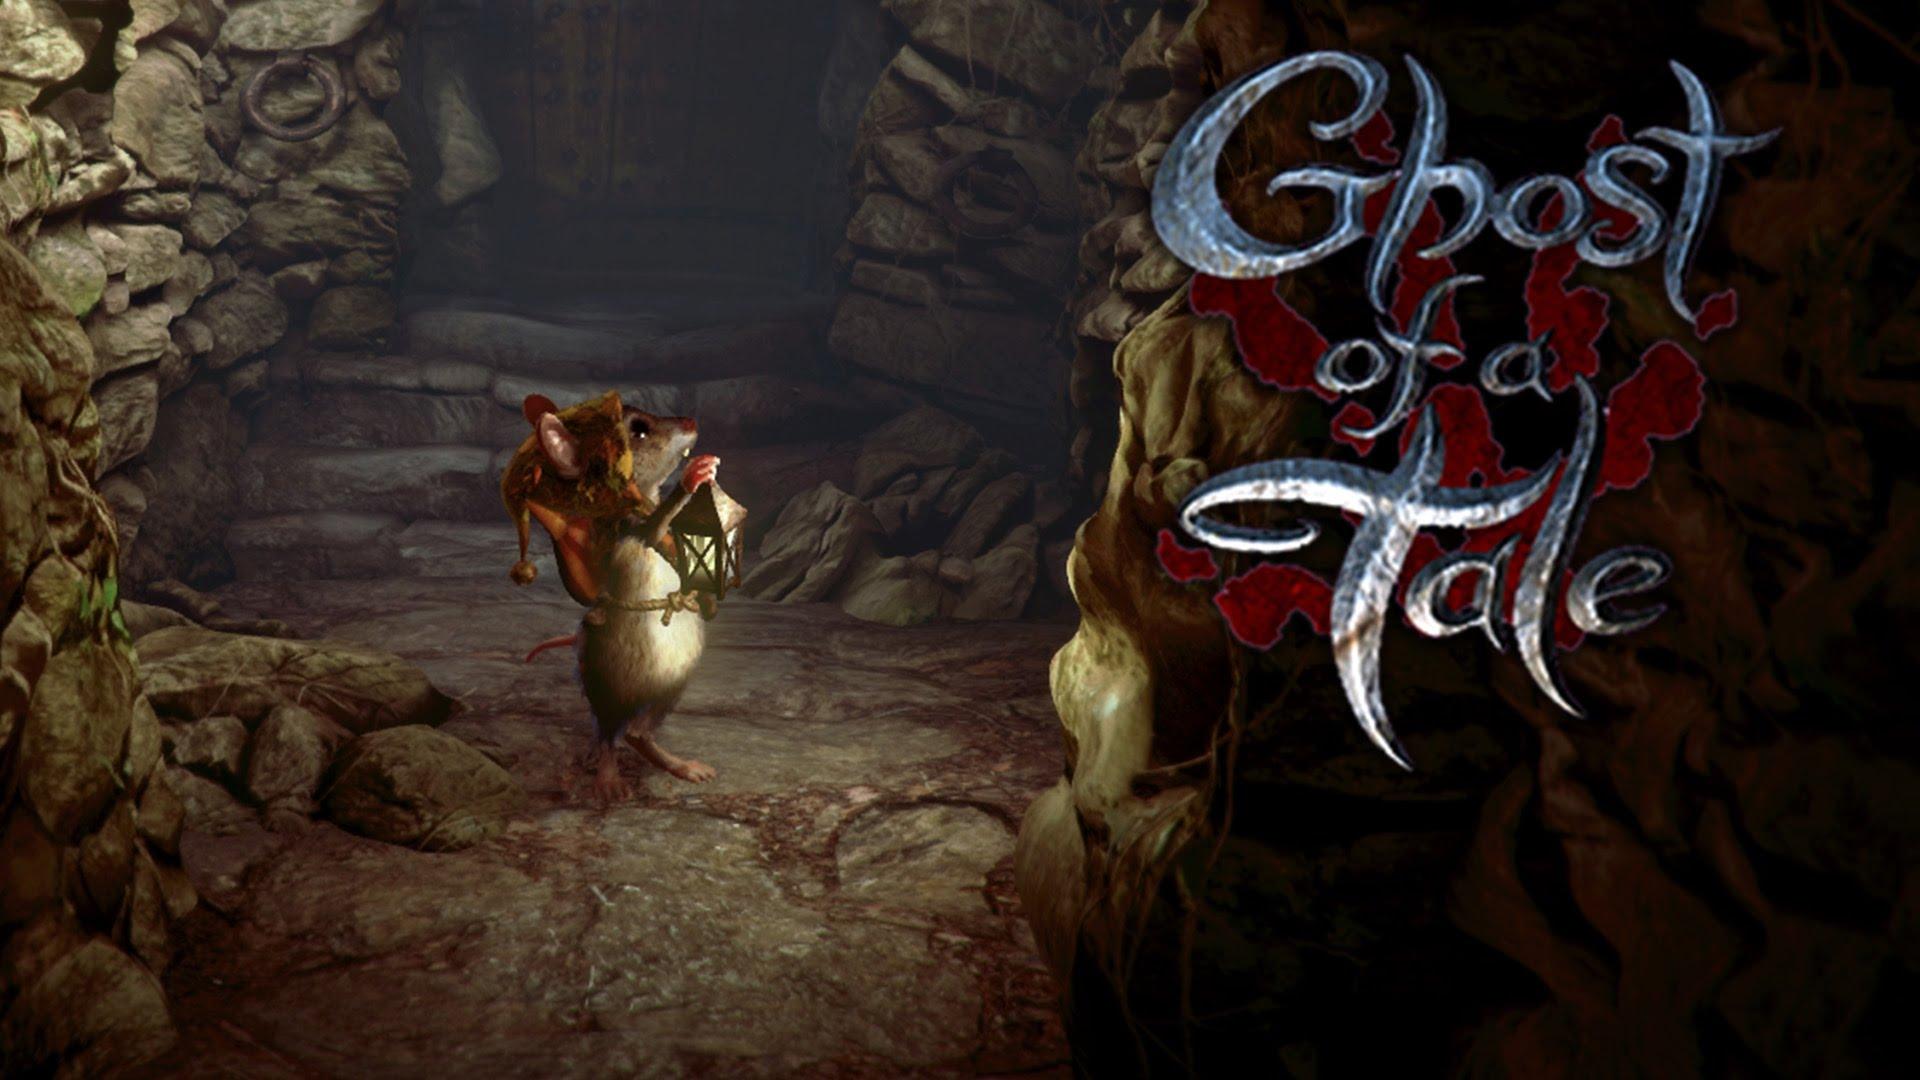 Ghost Of a Tale - In arrivo a febbraio 2019 su Ps4 e Xbox One - Nerdream.it